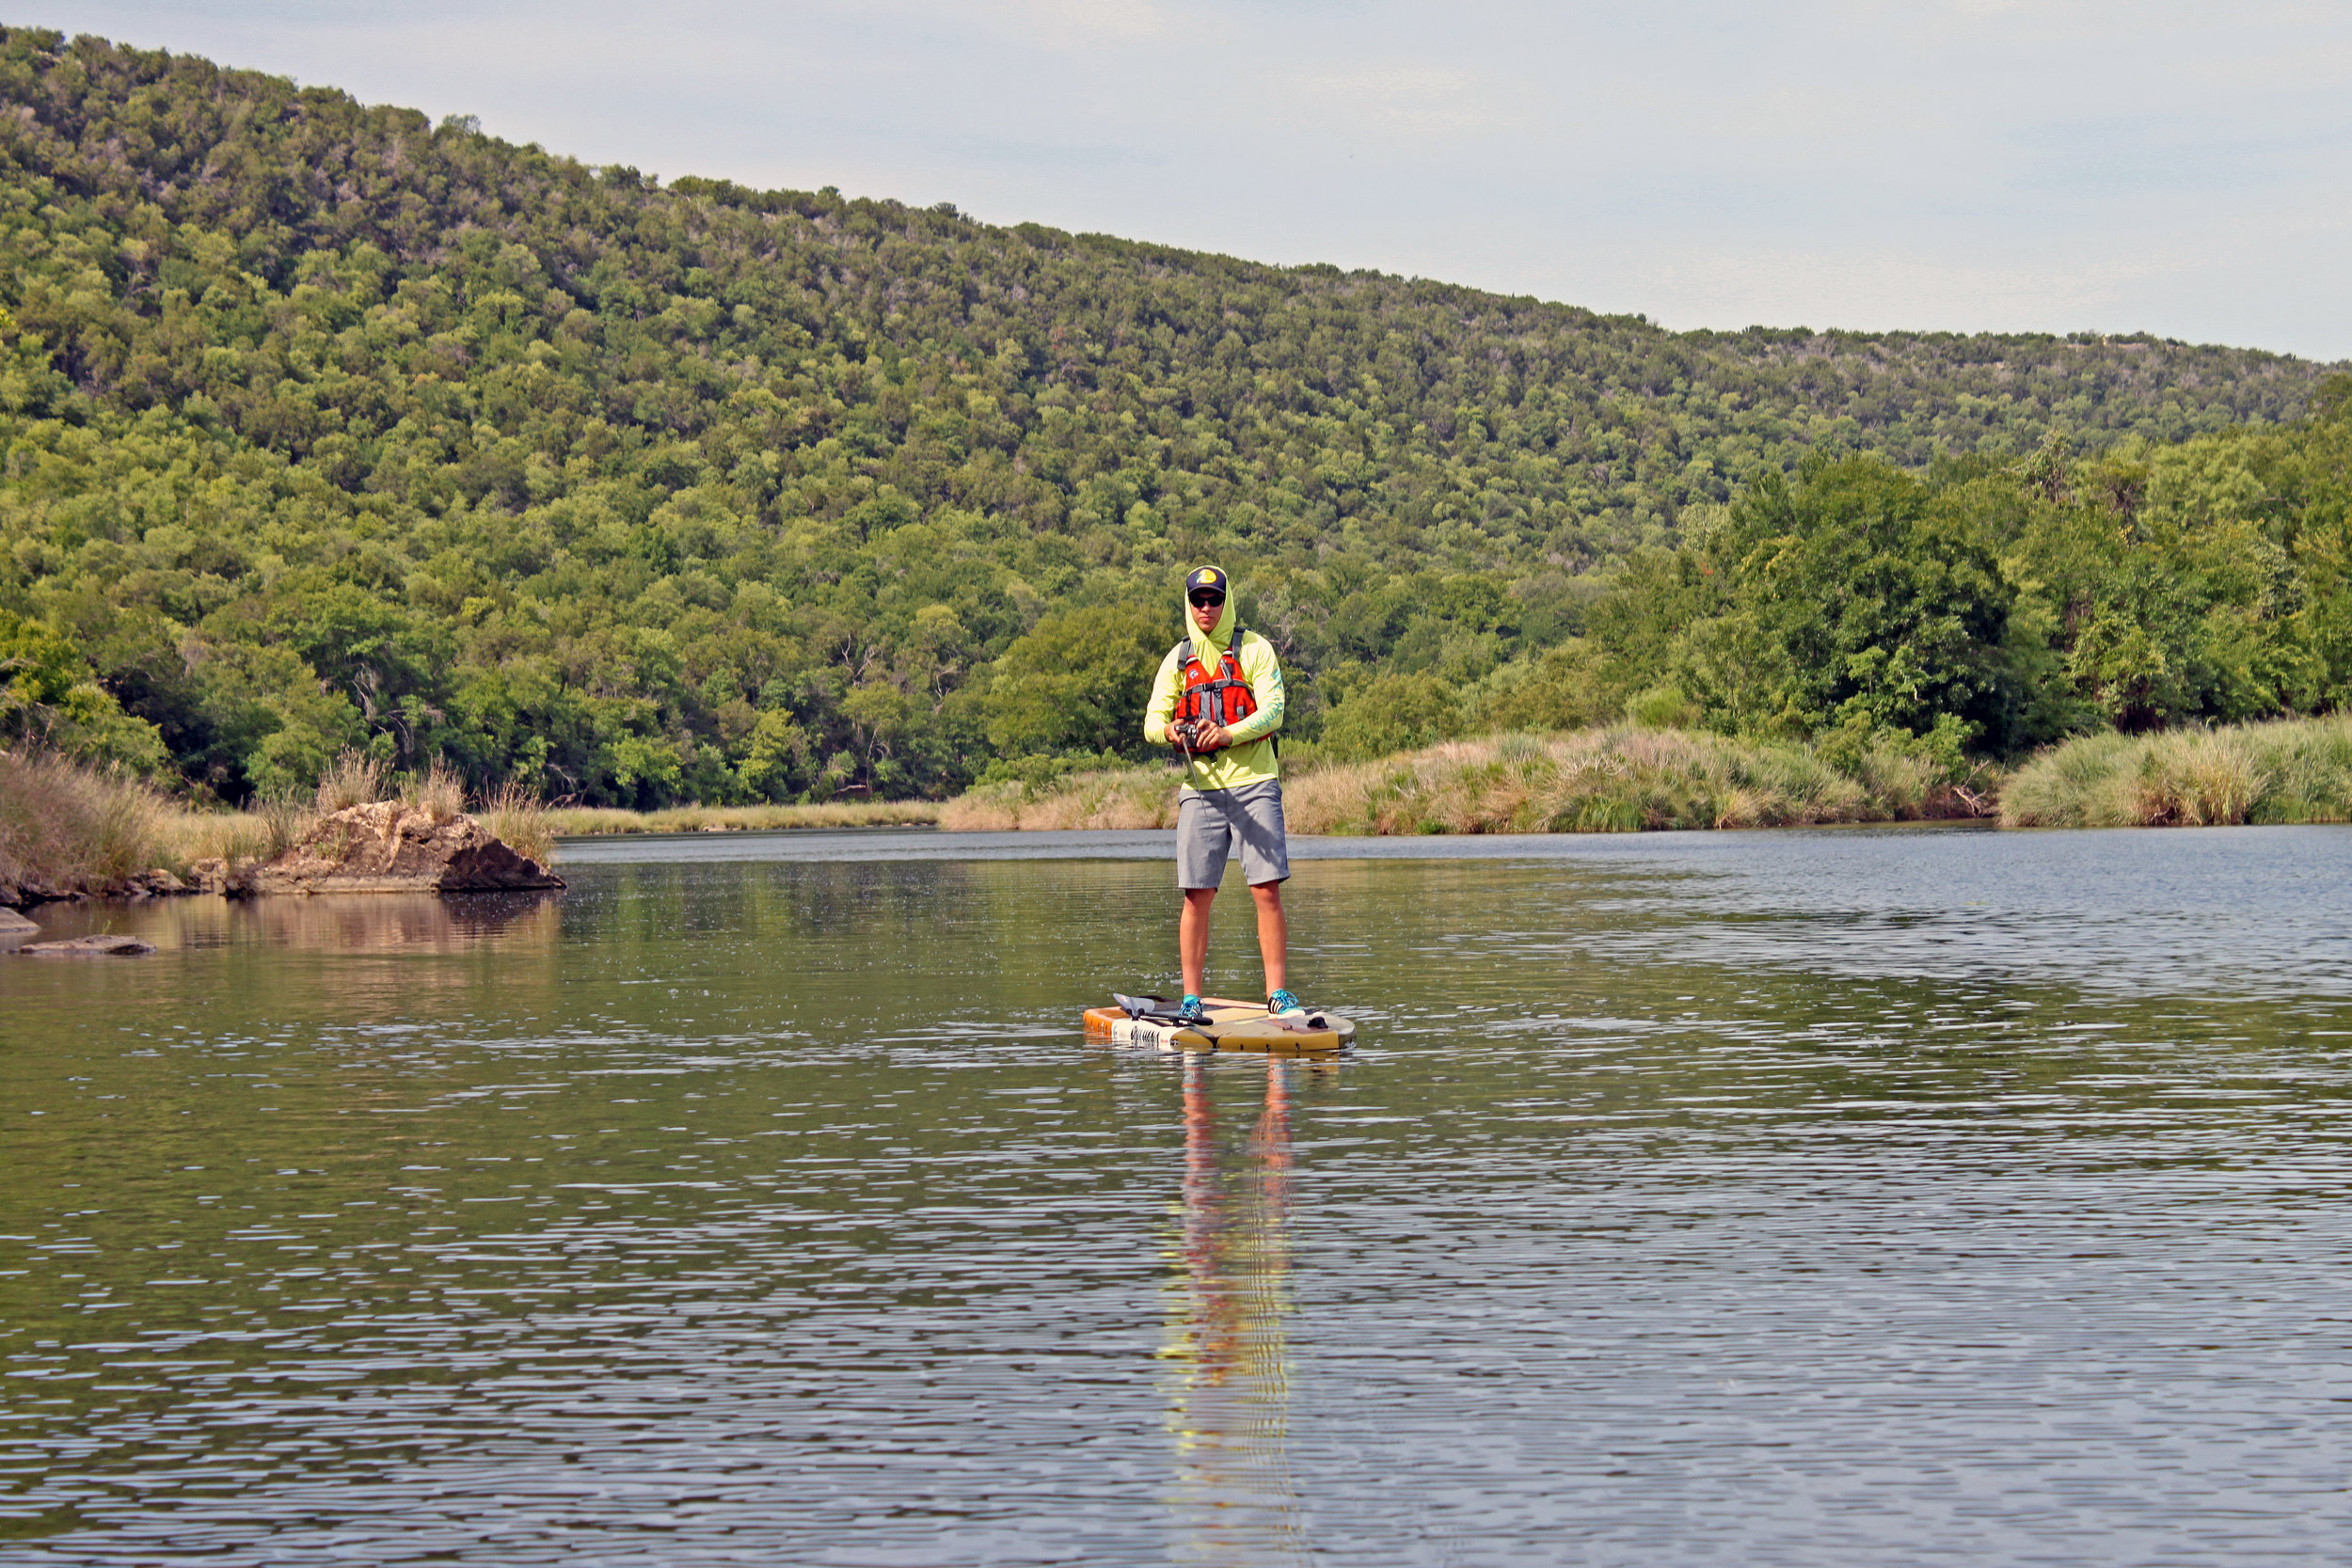 Clint Taylor Pau Hana Endurance Devils River